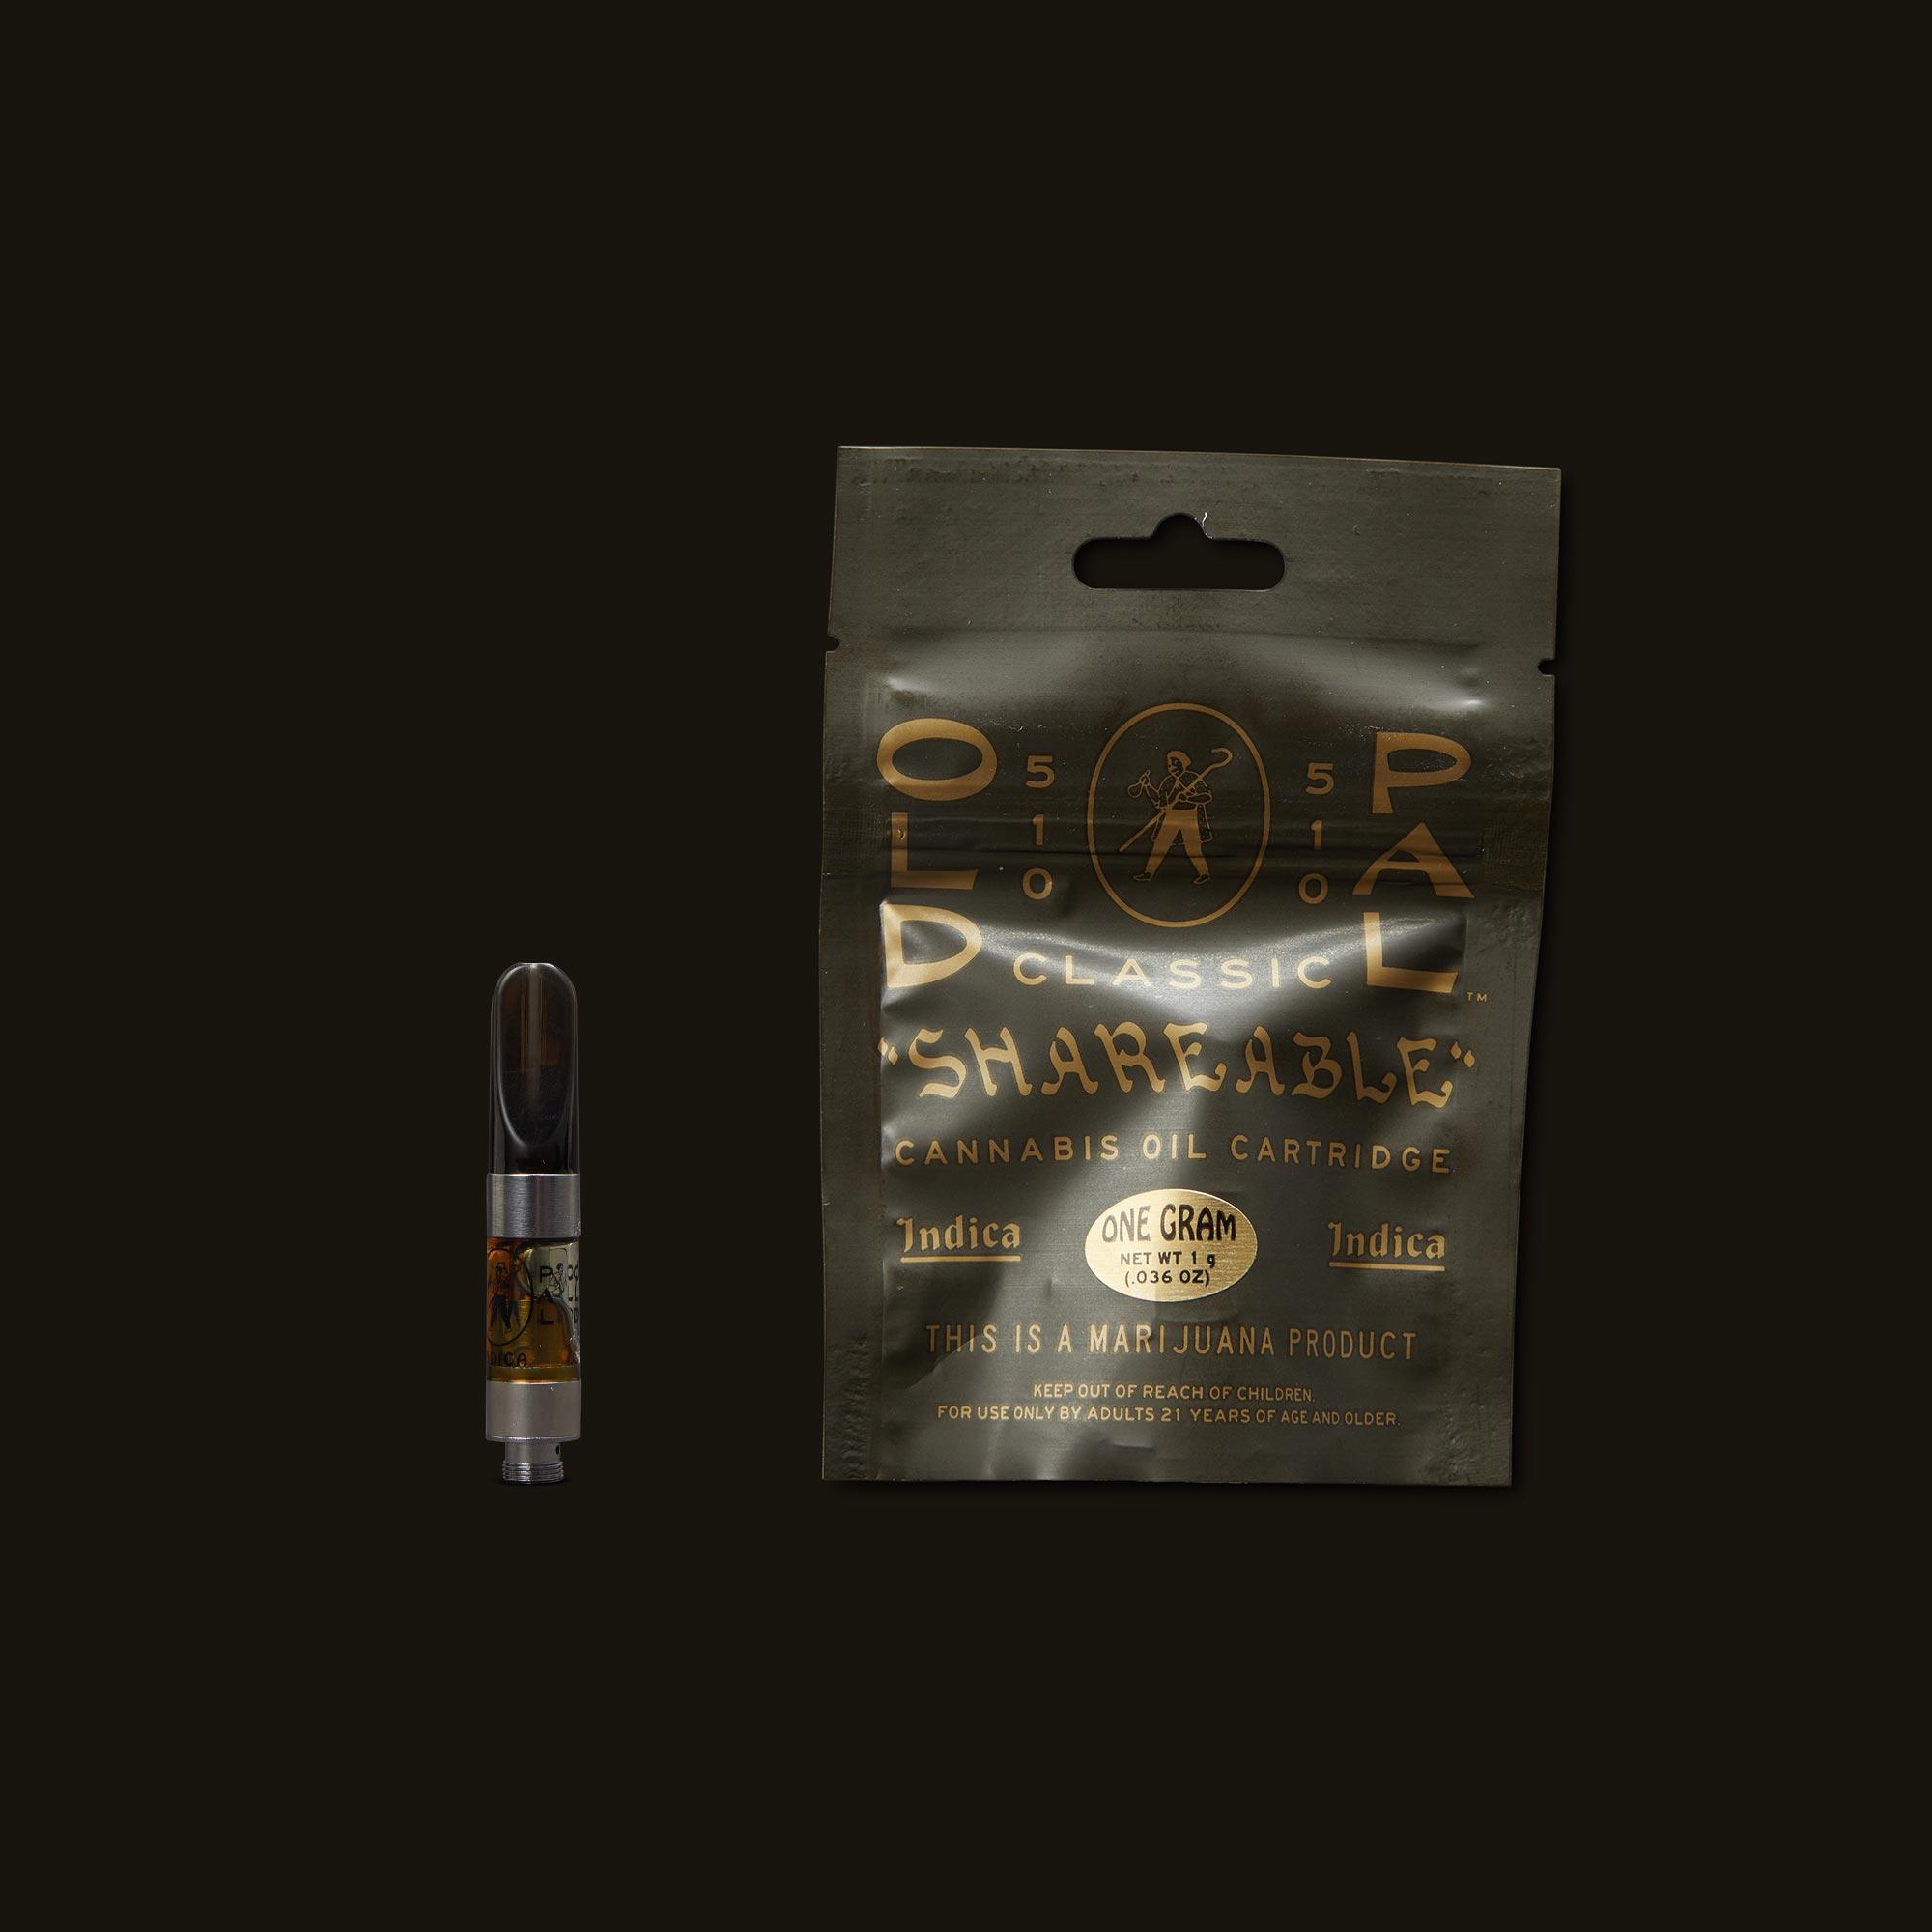 OLD PAL OG Kush Cartridge - 1g